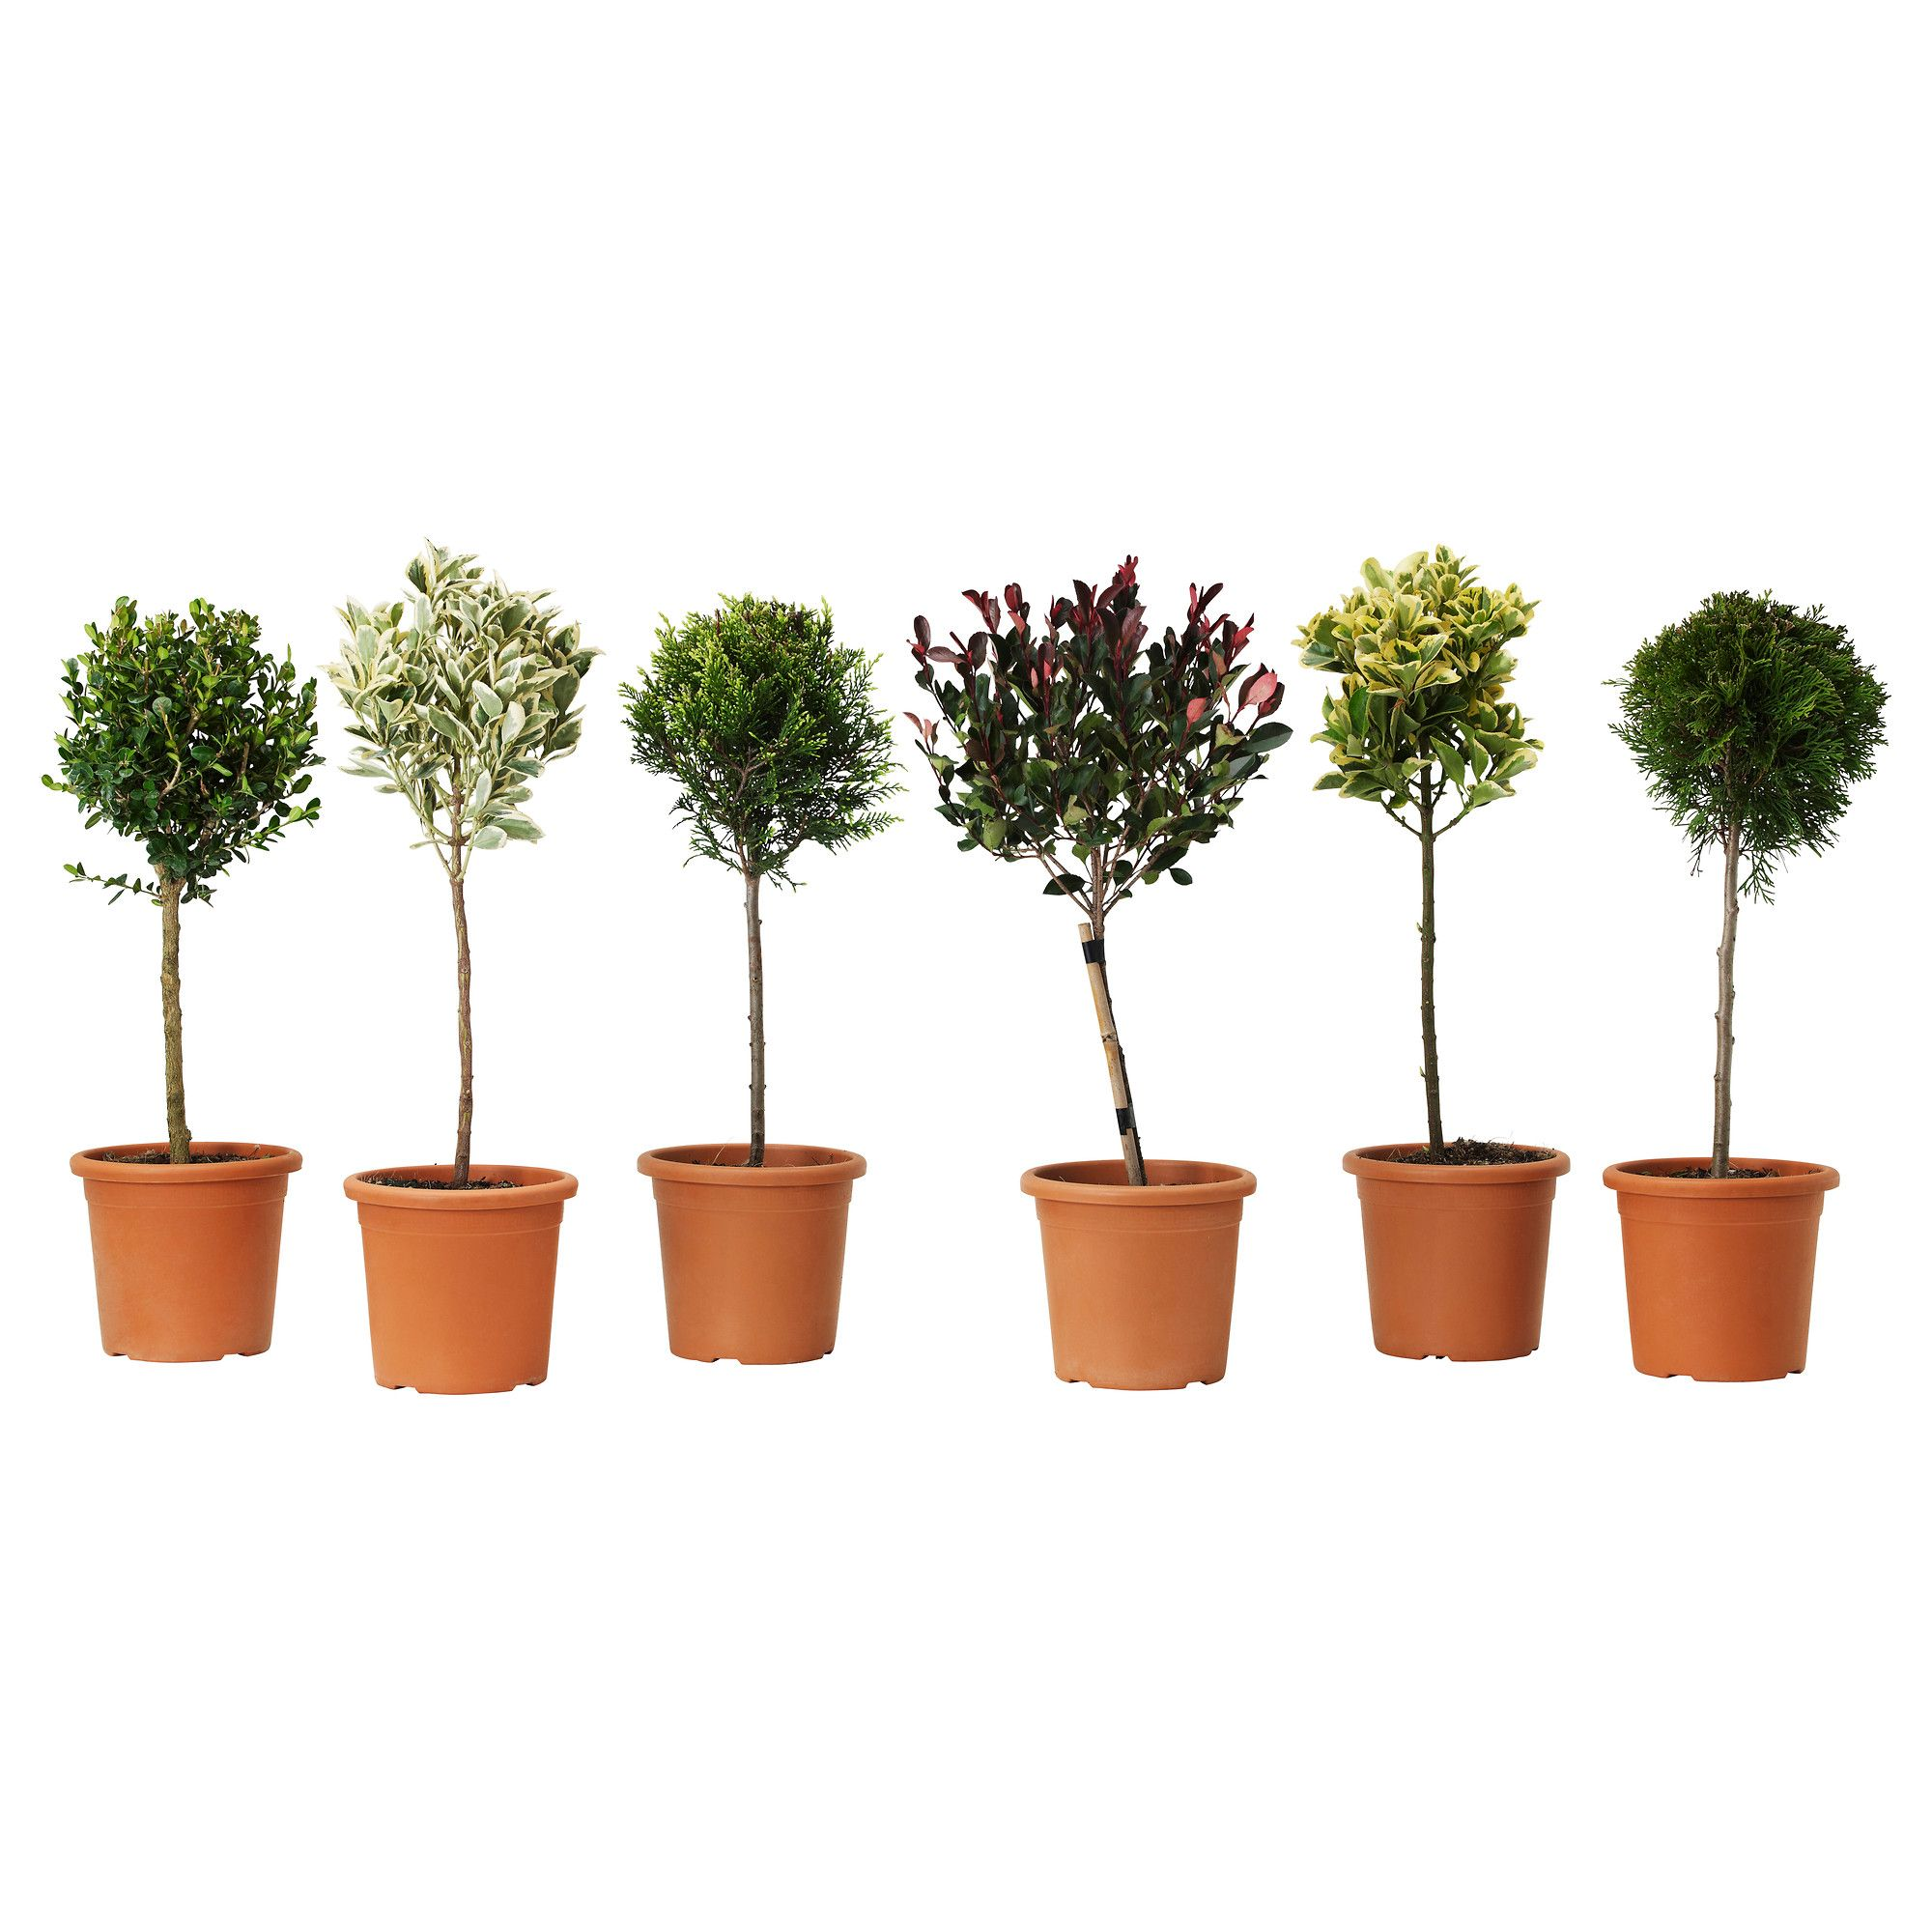 Schön Ikea Gartendeko Ideen